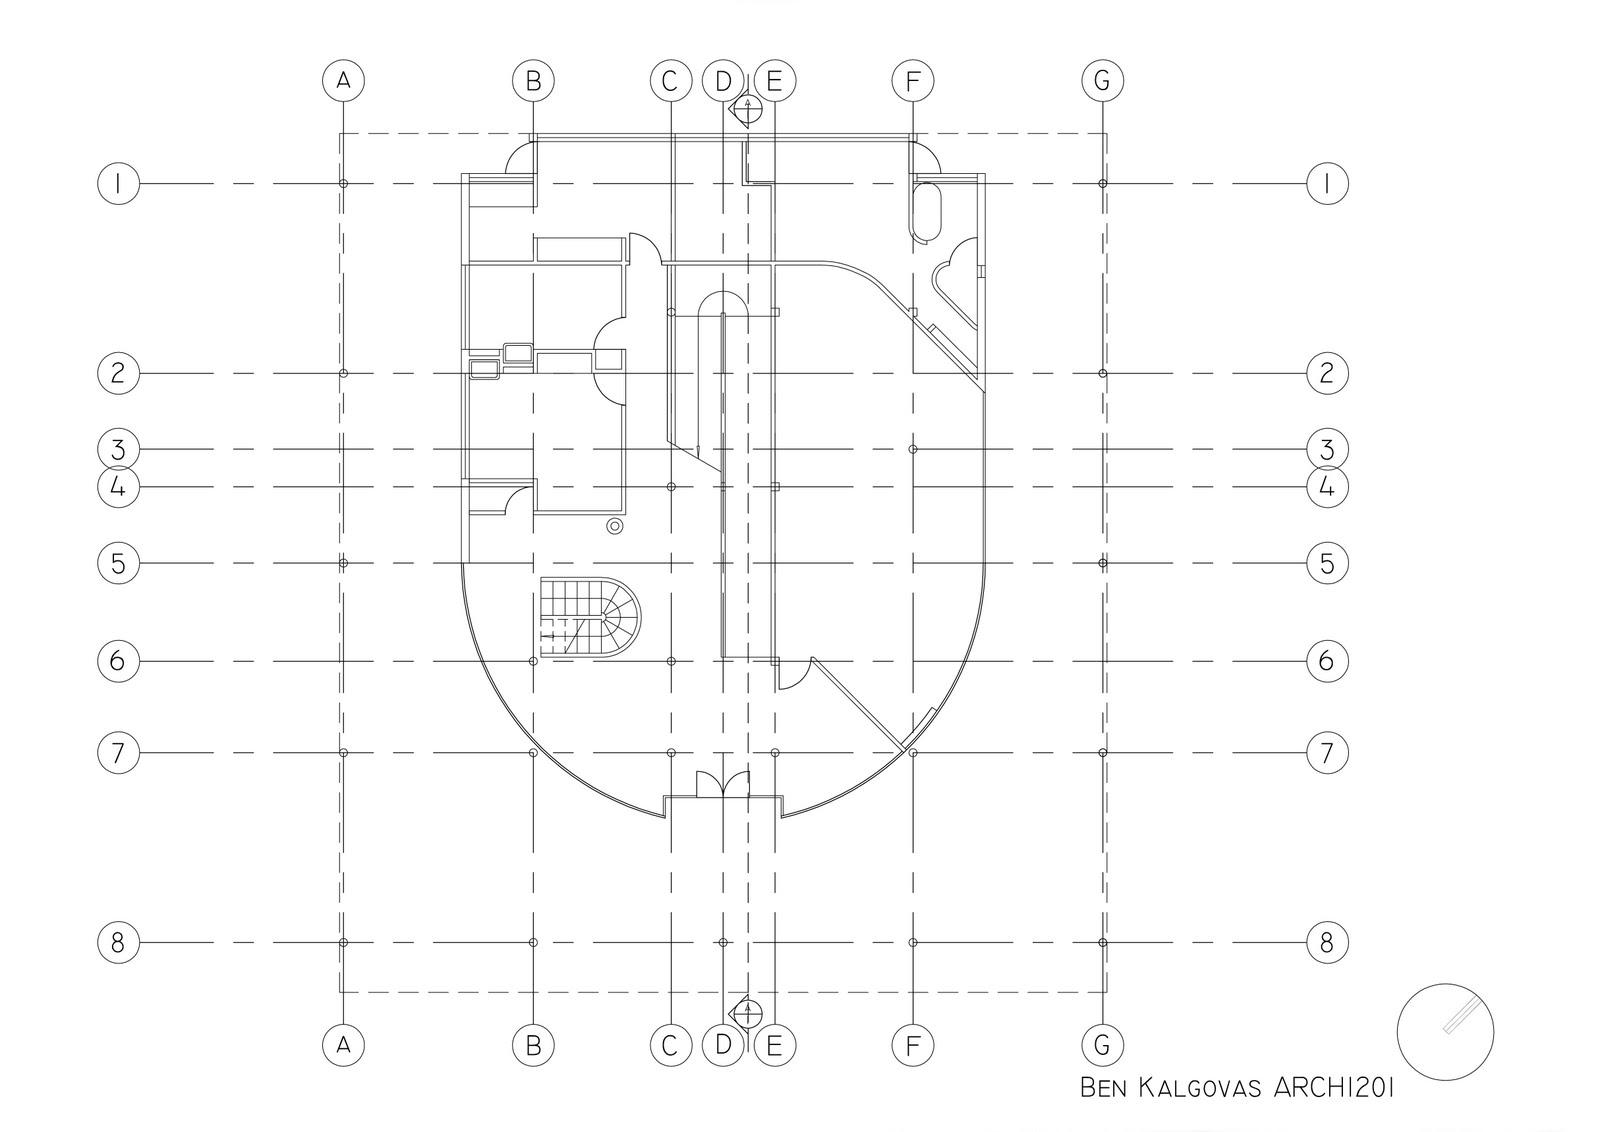 Masculine Bathroom Decorating Ideas. Image Result For Masculine Bathroom Decorating Ideas